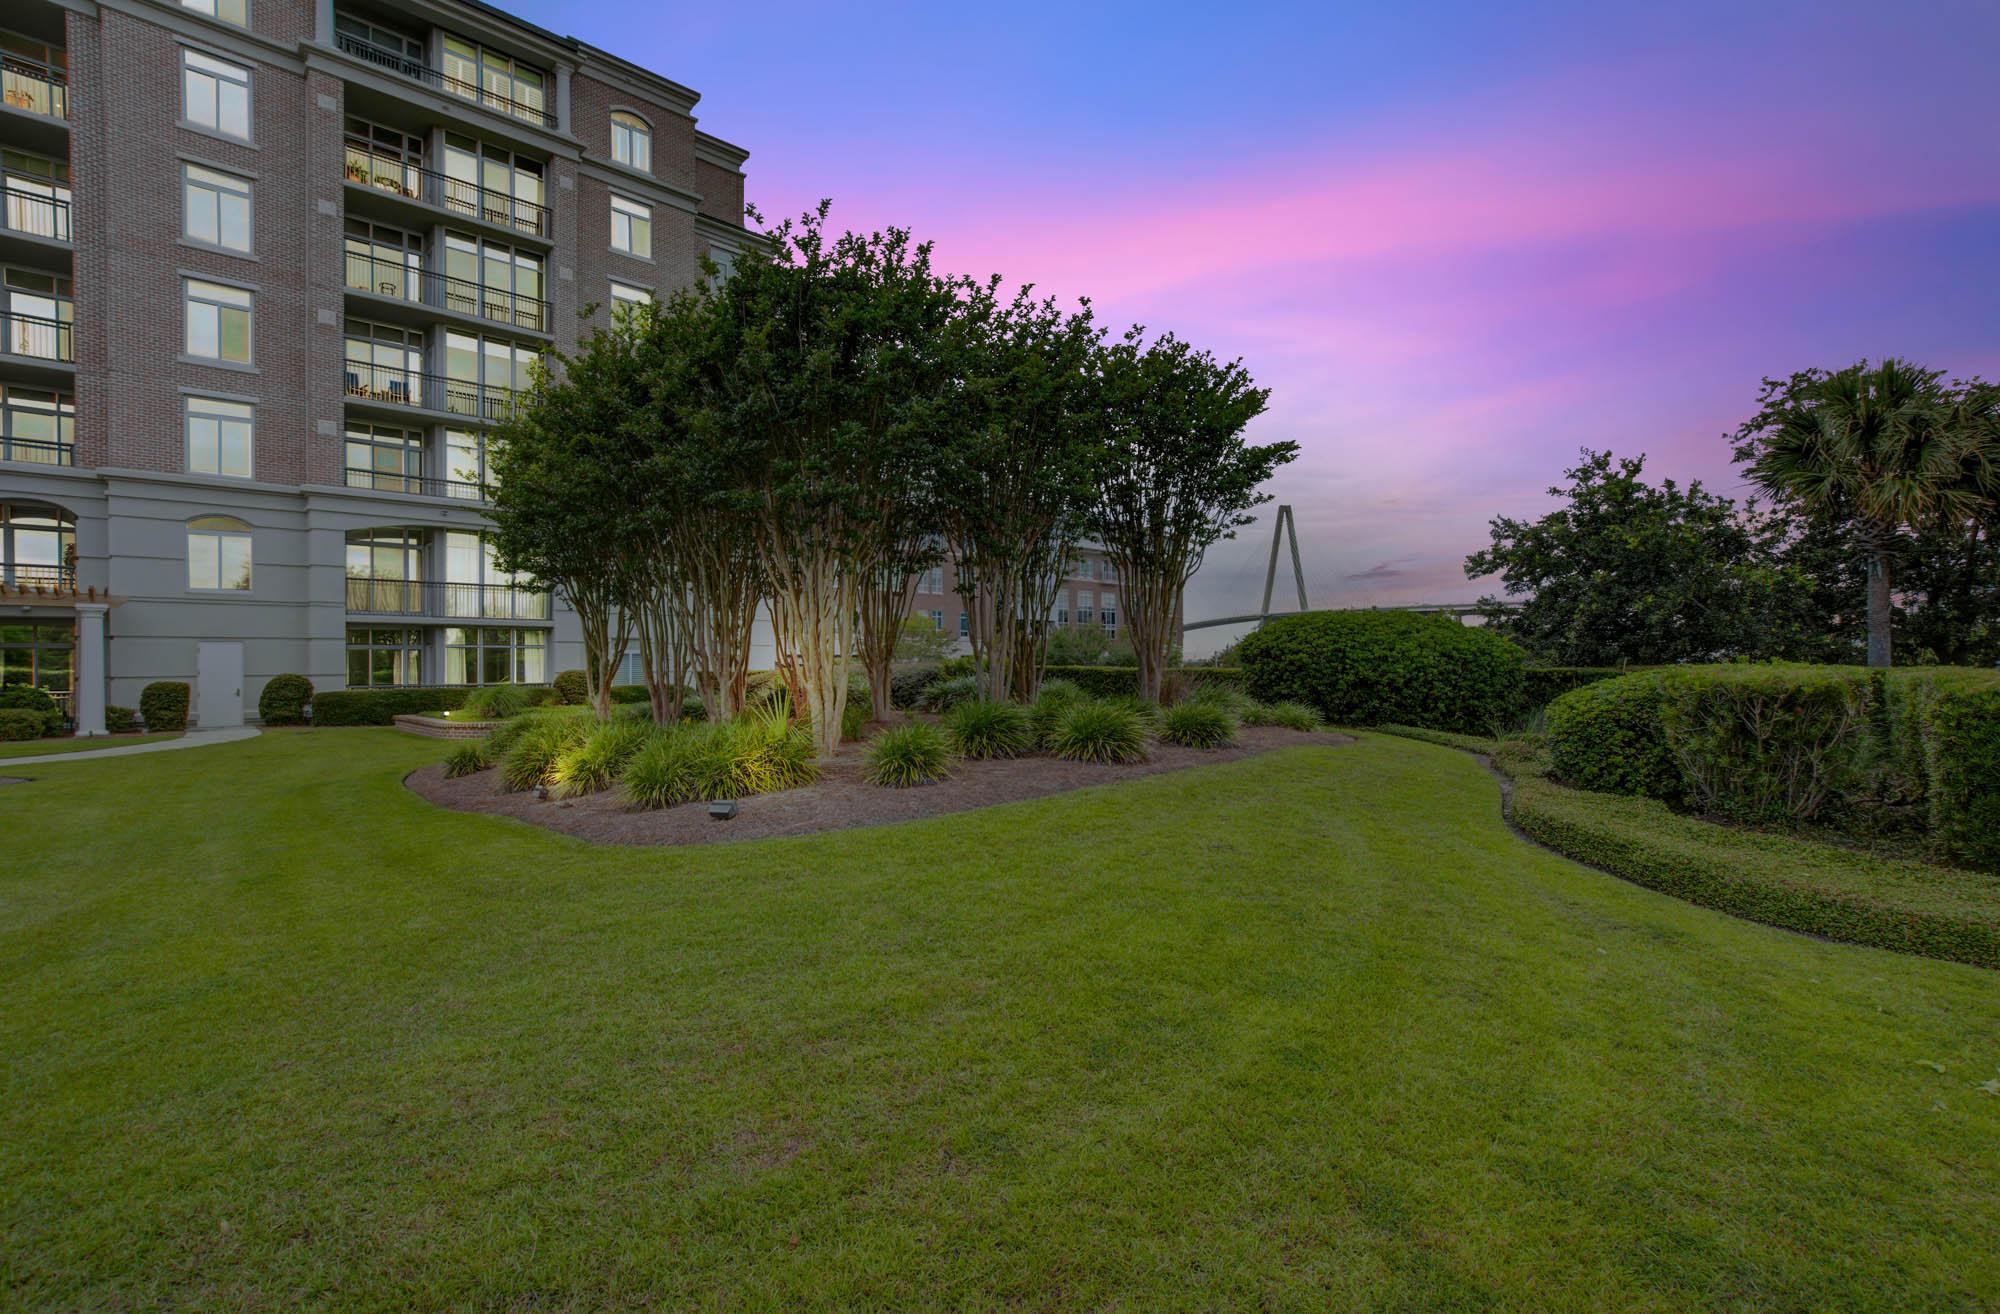 Renaissance On Chas Harbor Homes For Sale - 231 Plaza, Mount Pleasant, SC - 0